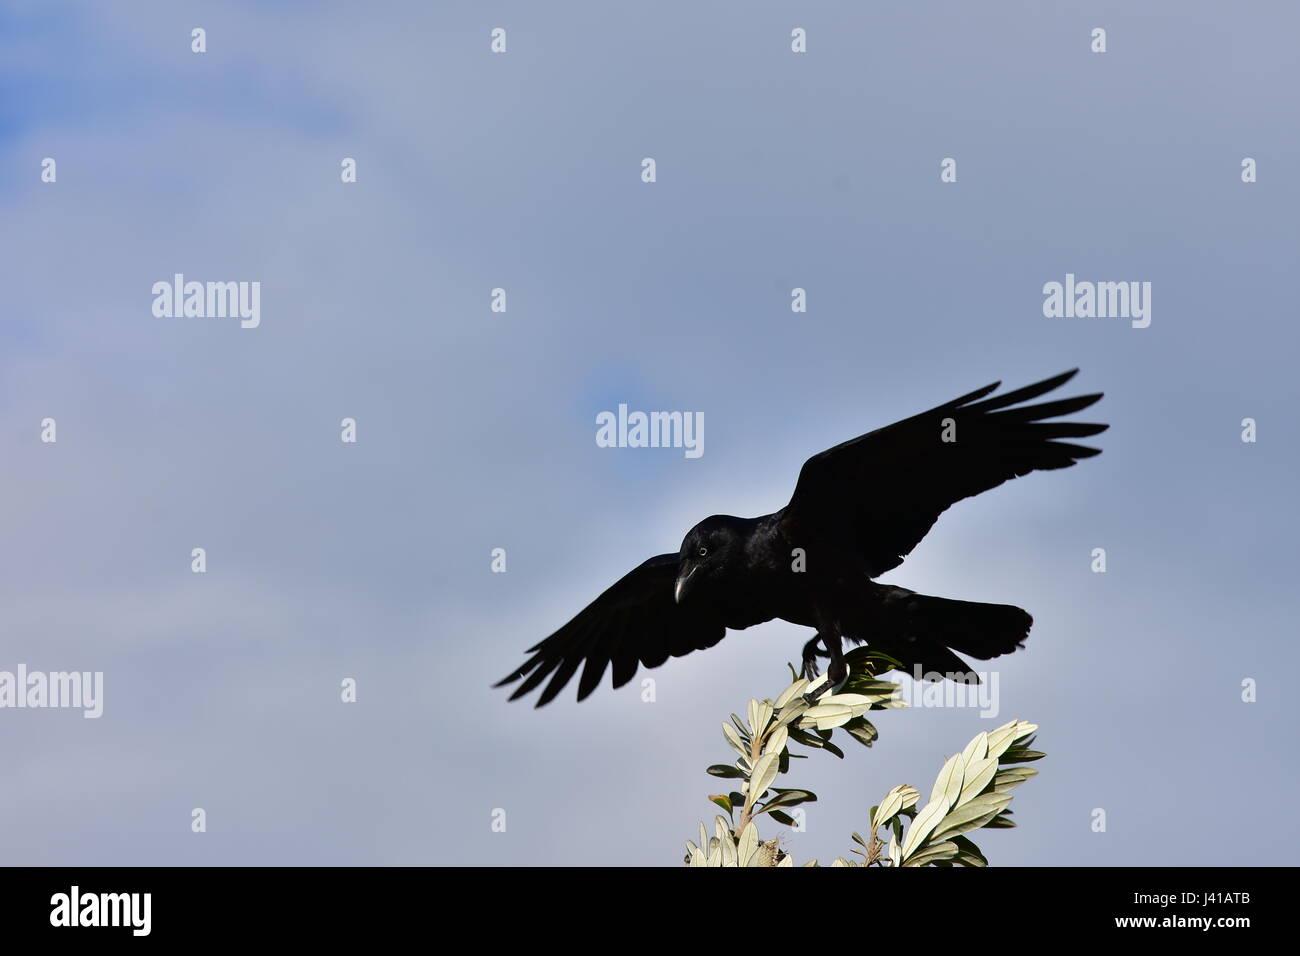 Australian raven Corvus coronoides on thin tree branch ready to take off. - Stock Image